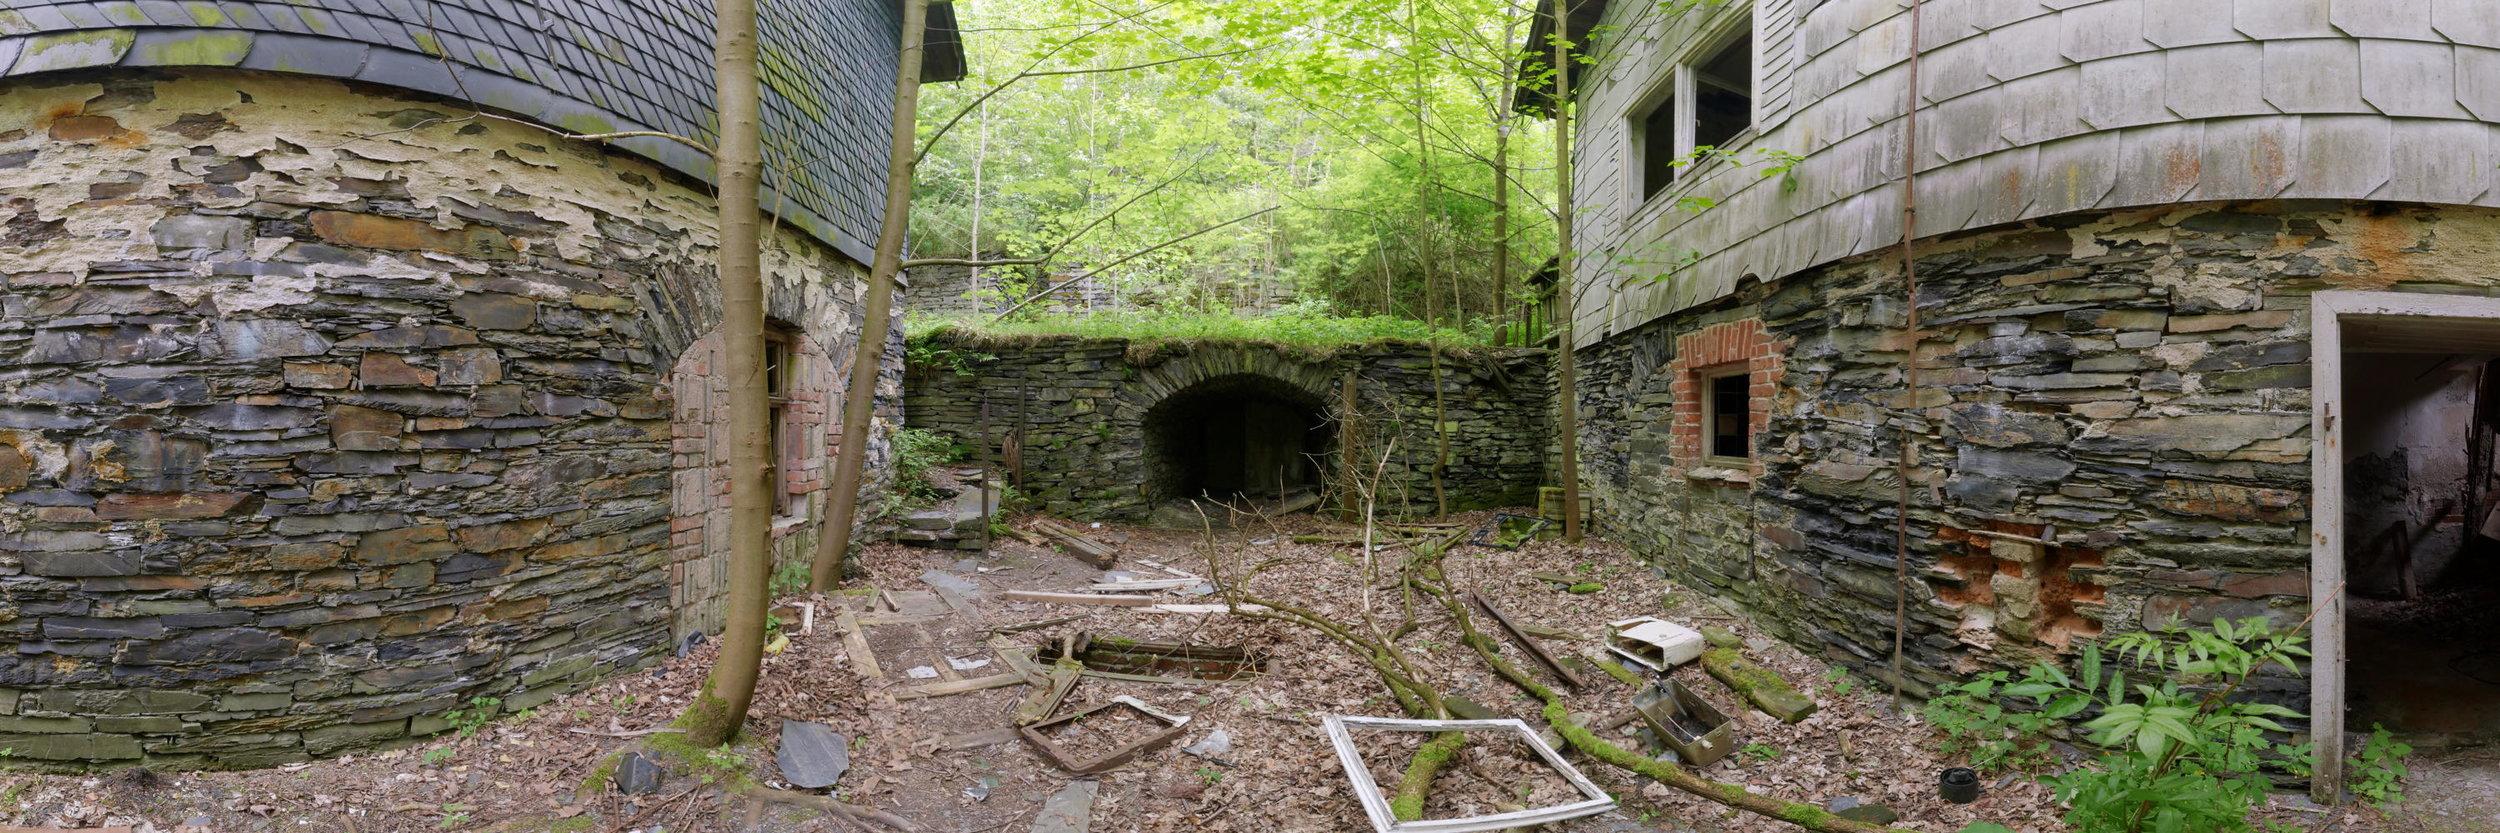 Tunneleingang.jpg